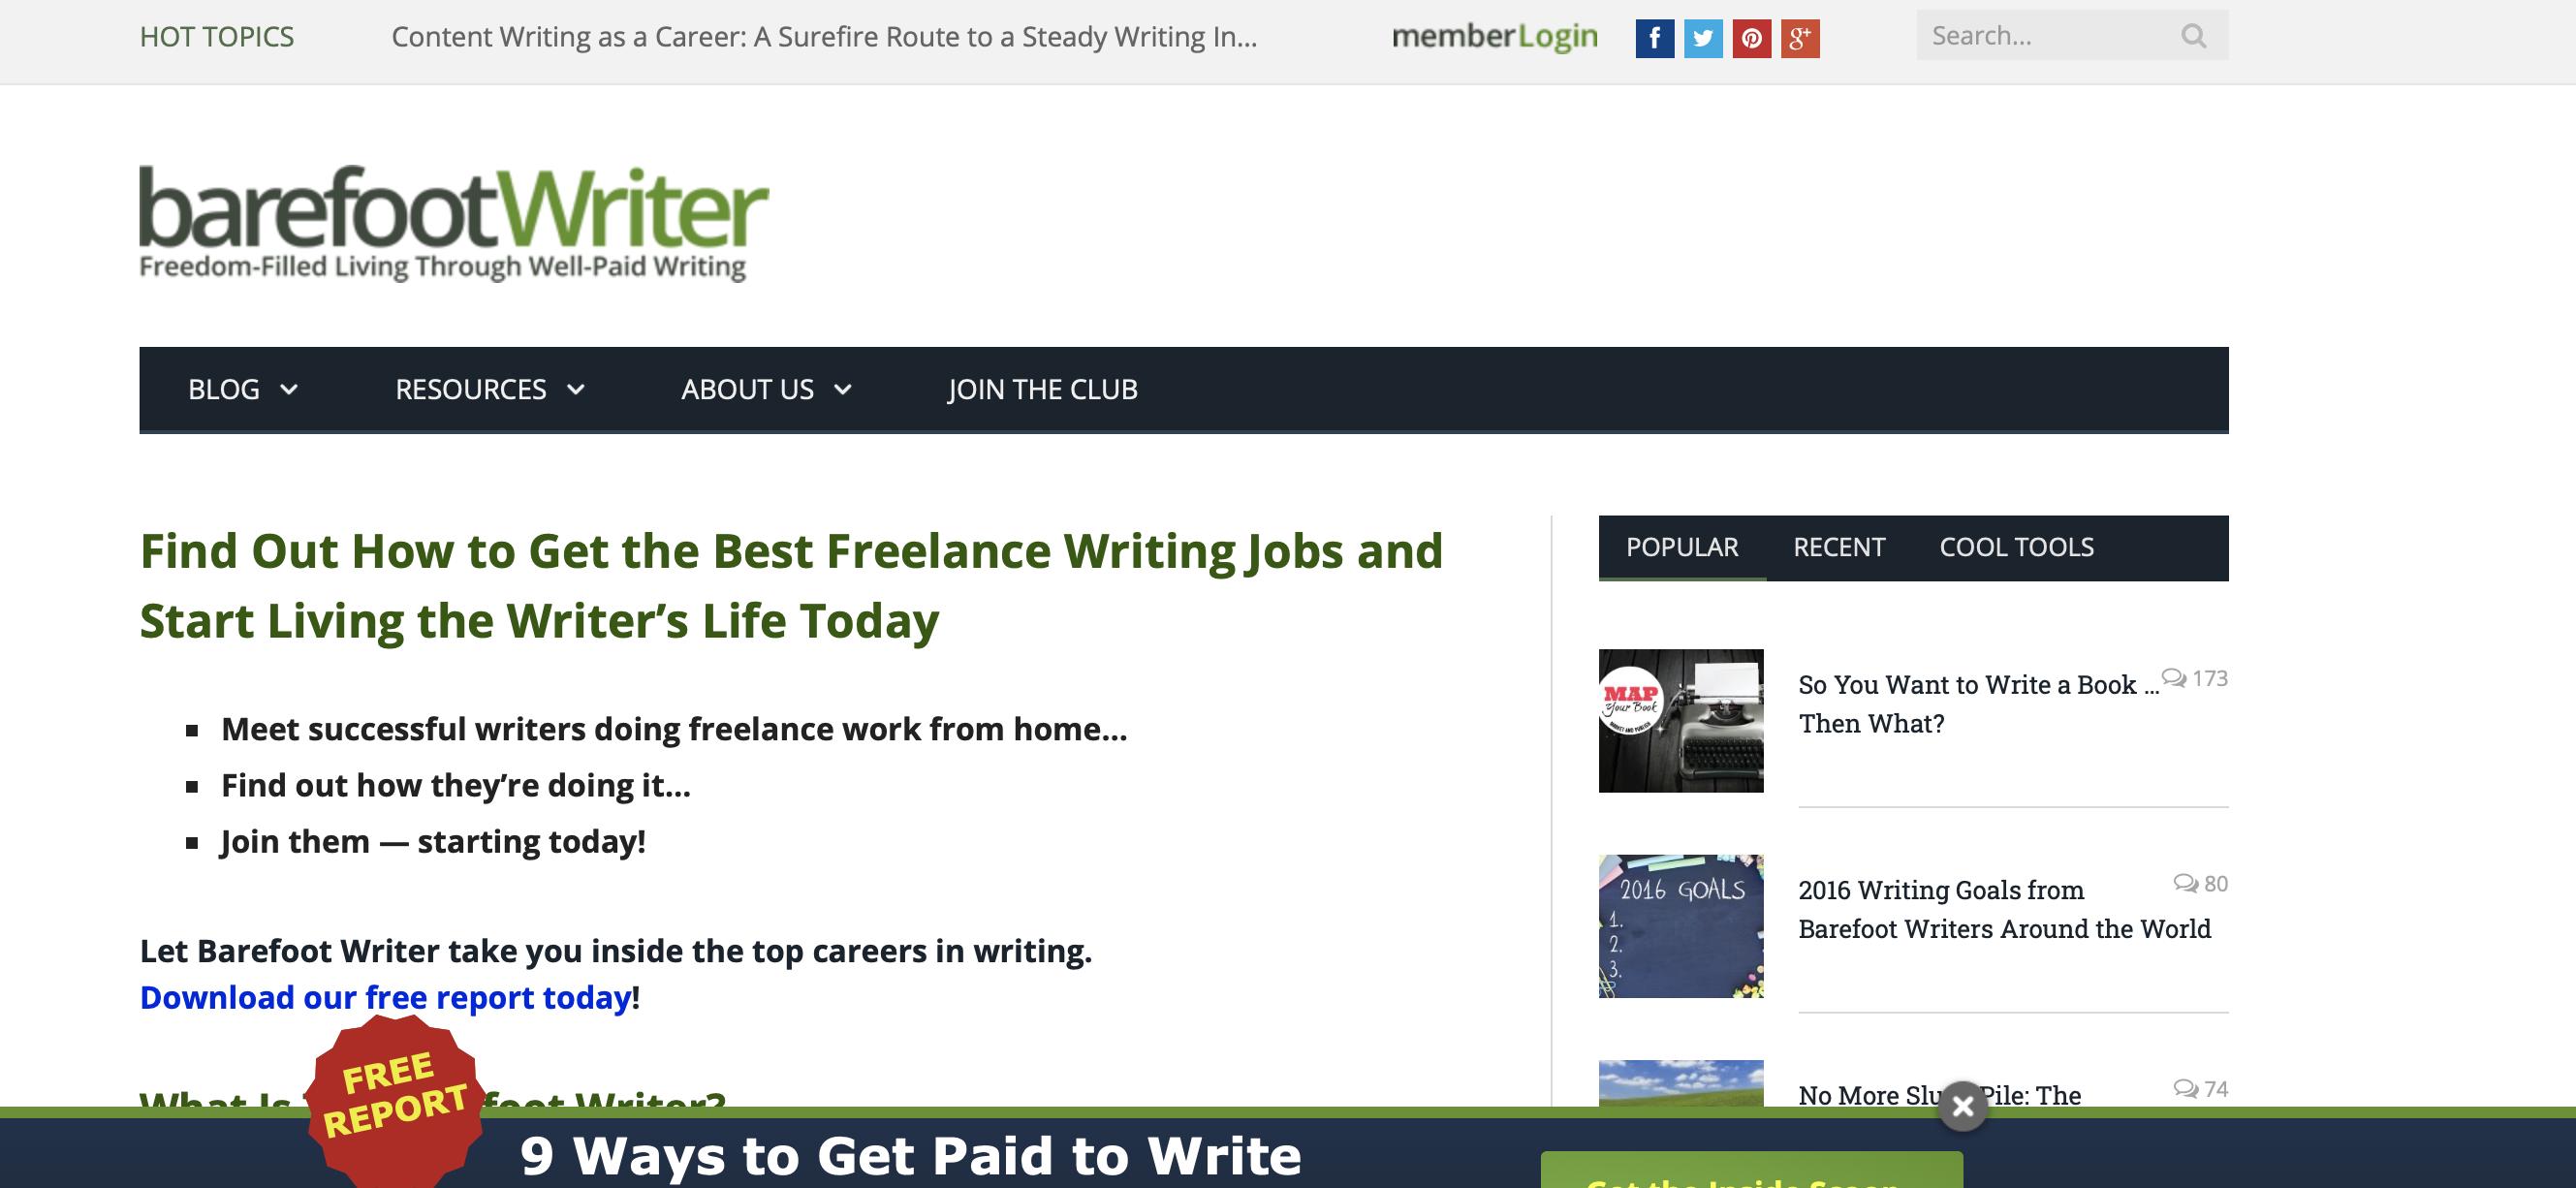 barefoot writer website